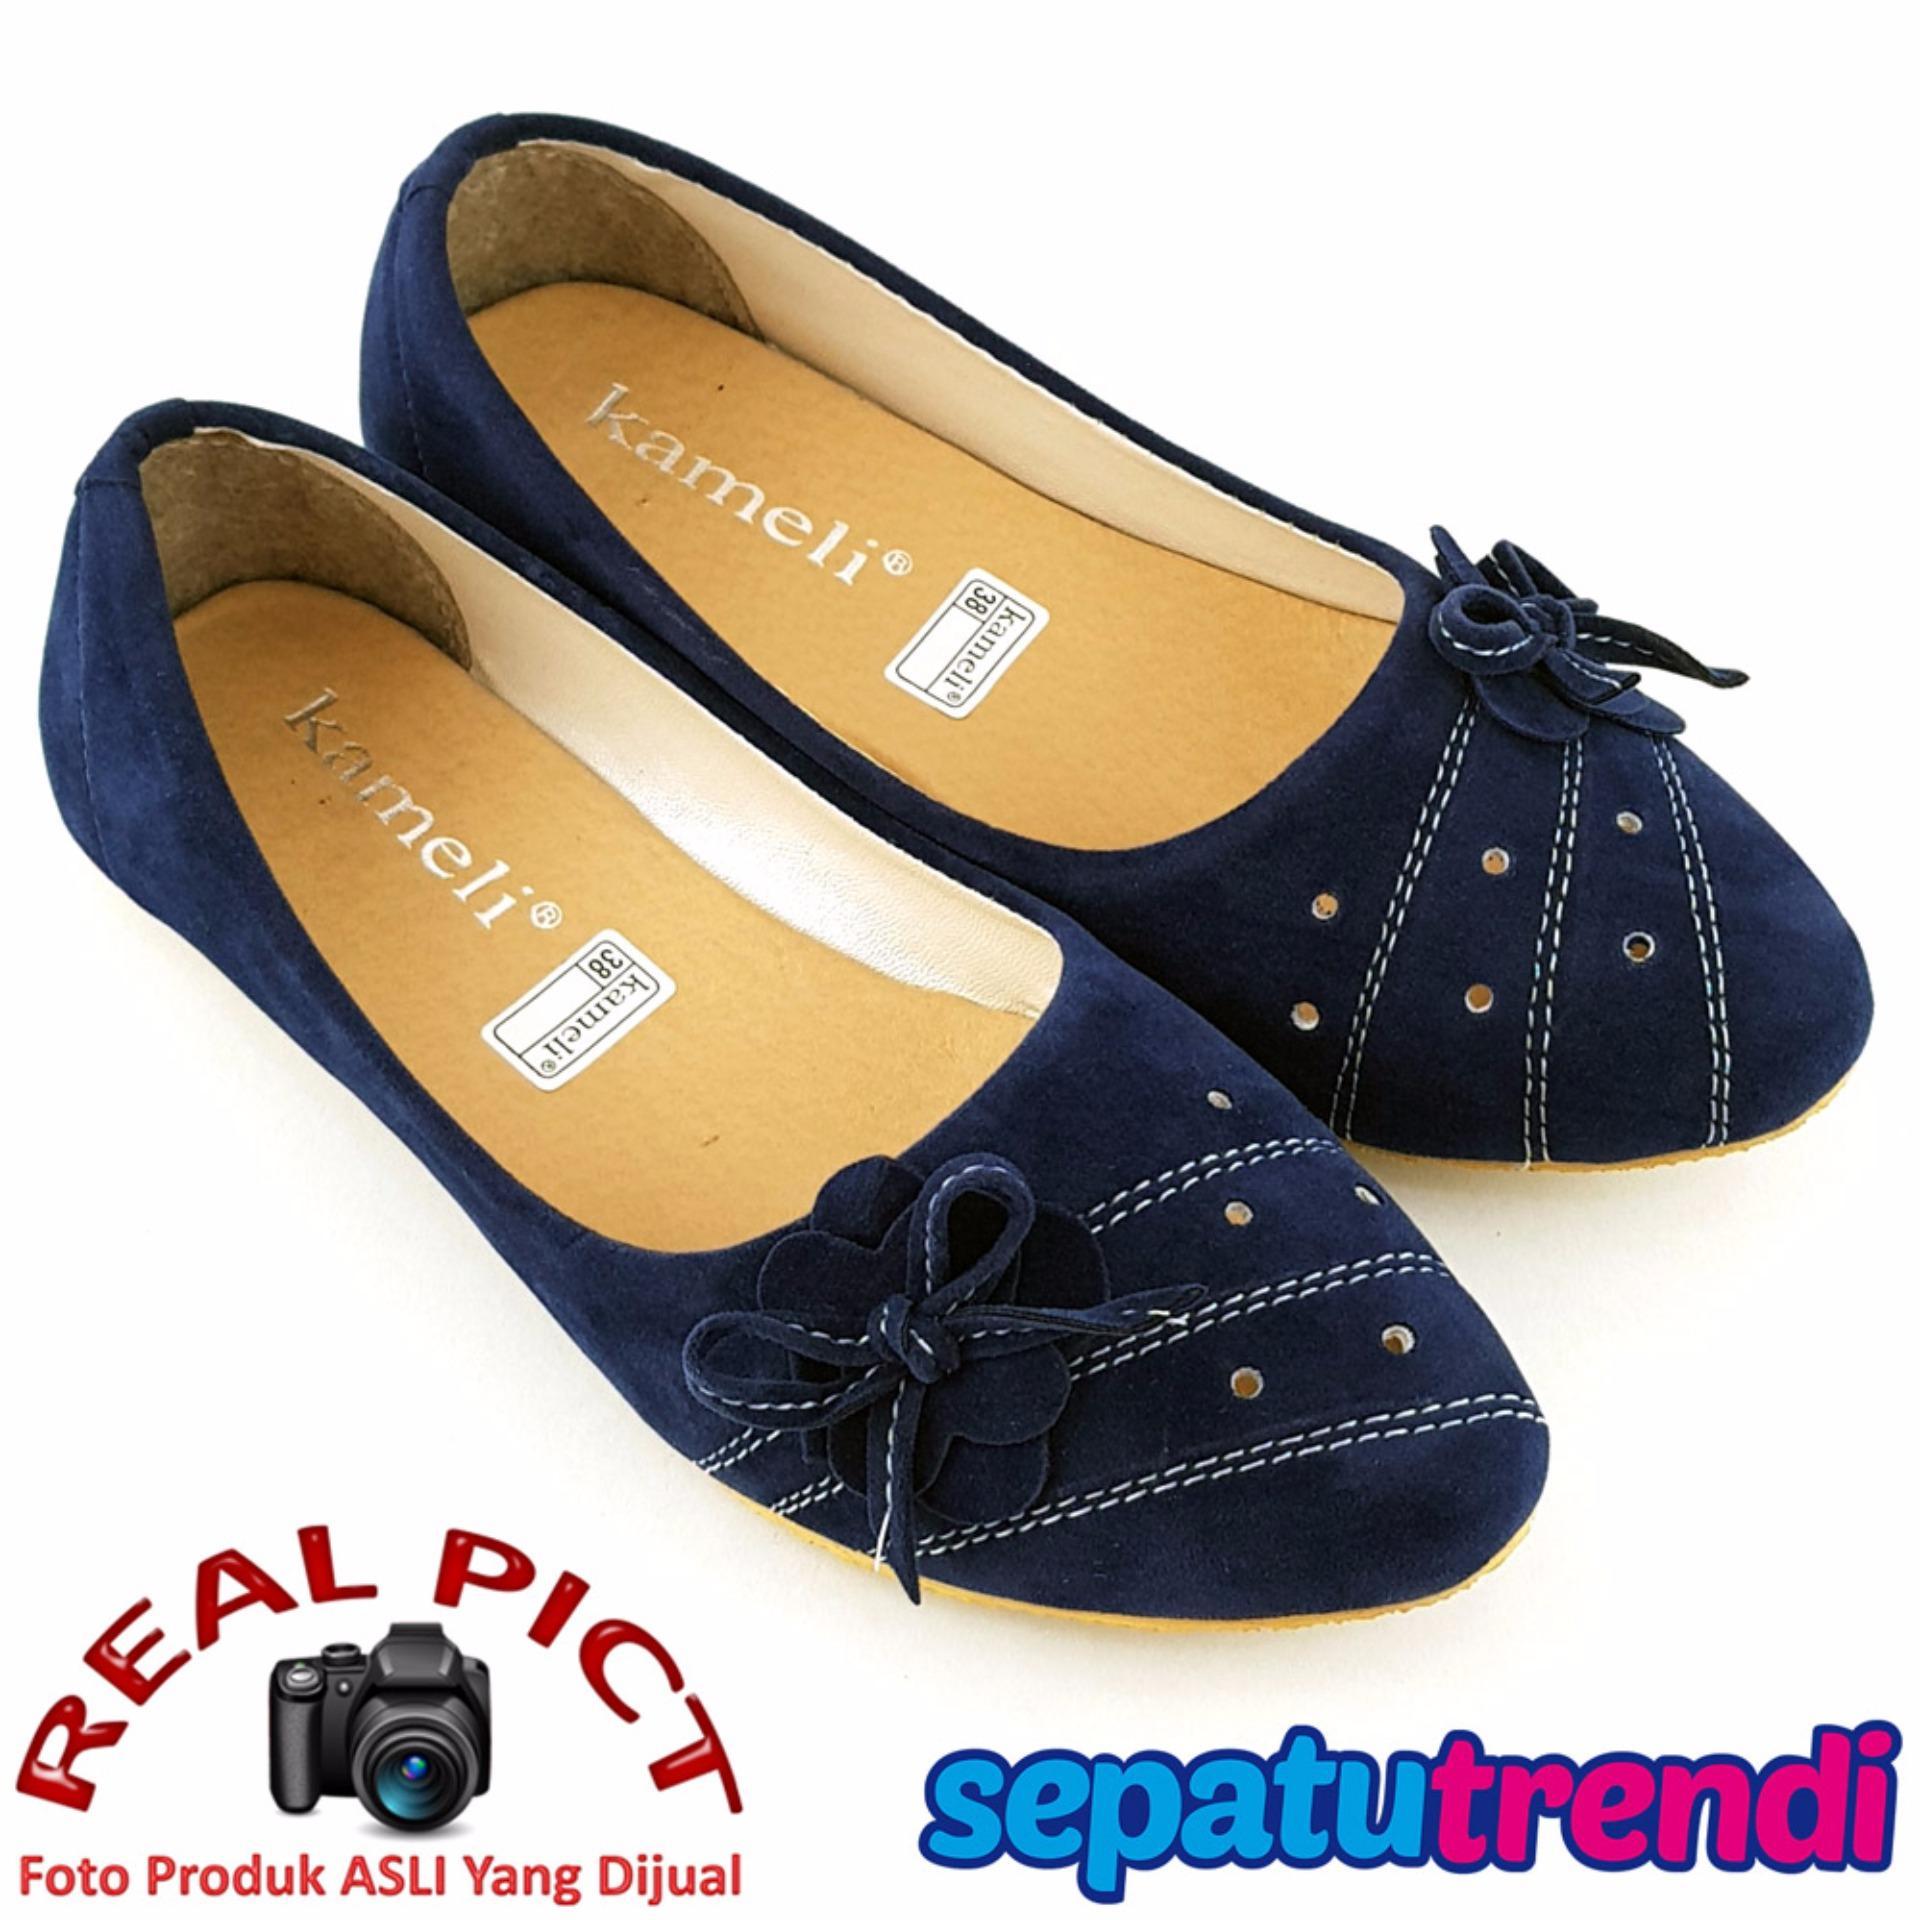 ... Sepatu Wanita Pantofel Sepatu Flatshoes Flat Shoes Lv Birdong Source Rp 36 760 TrendiShoes Sepatu Wanita